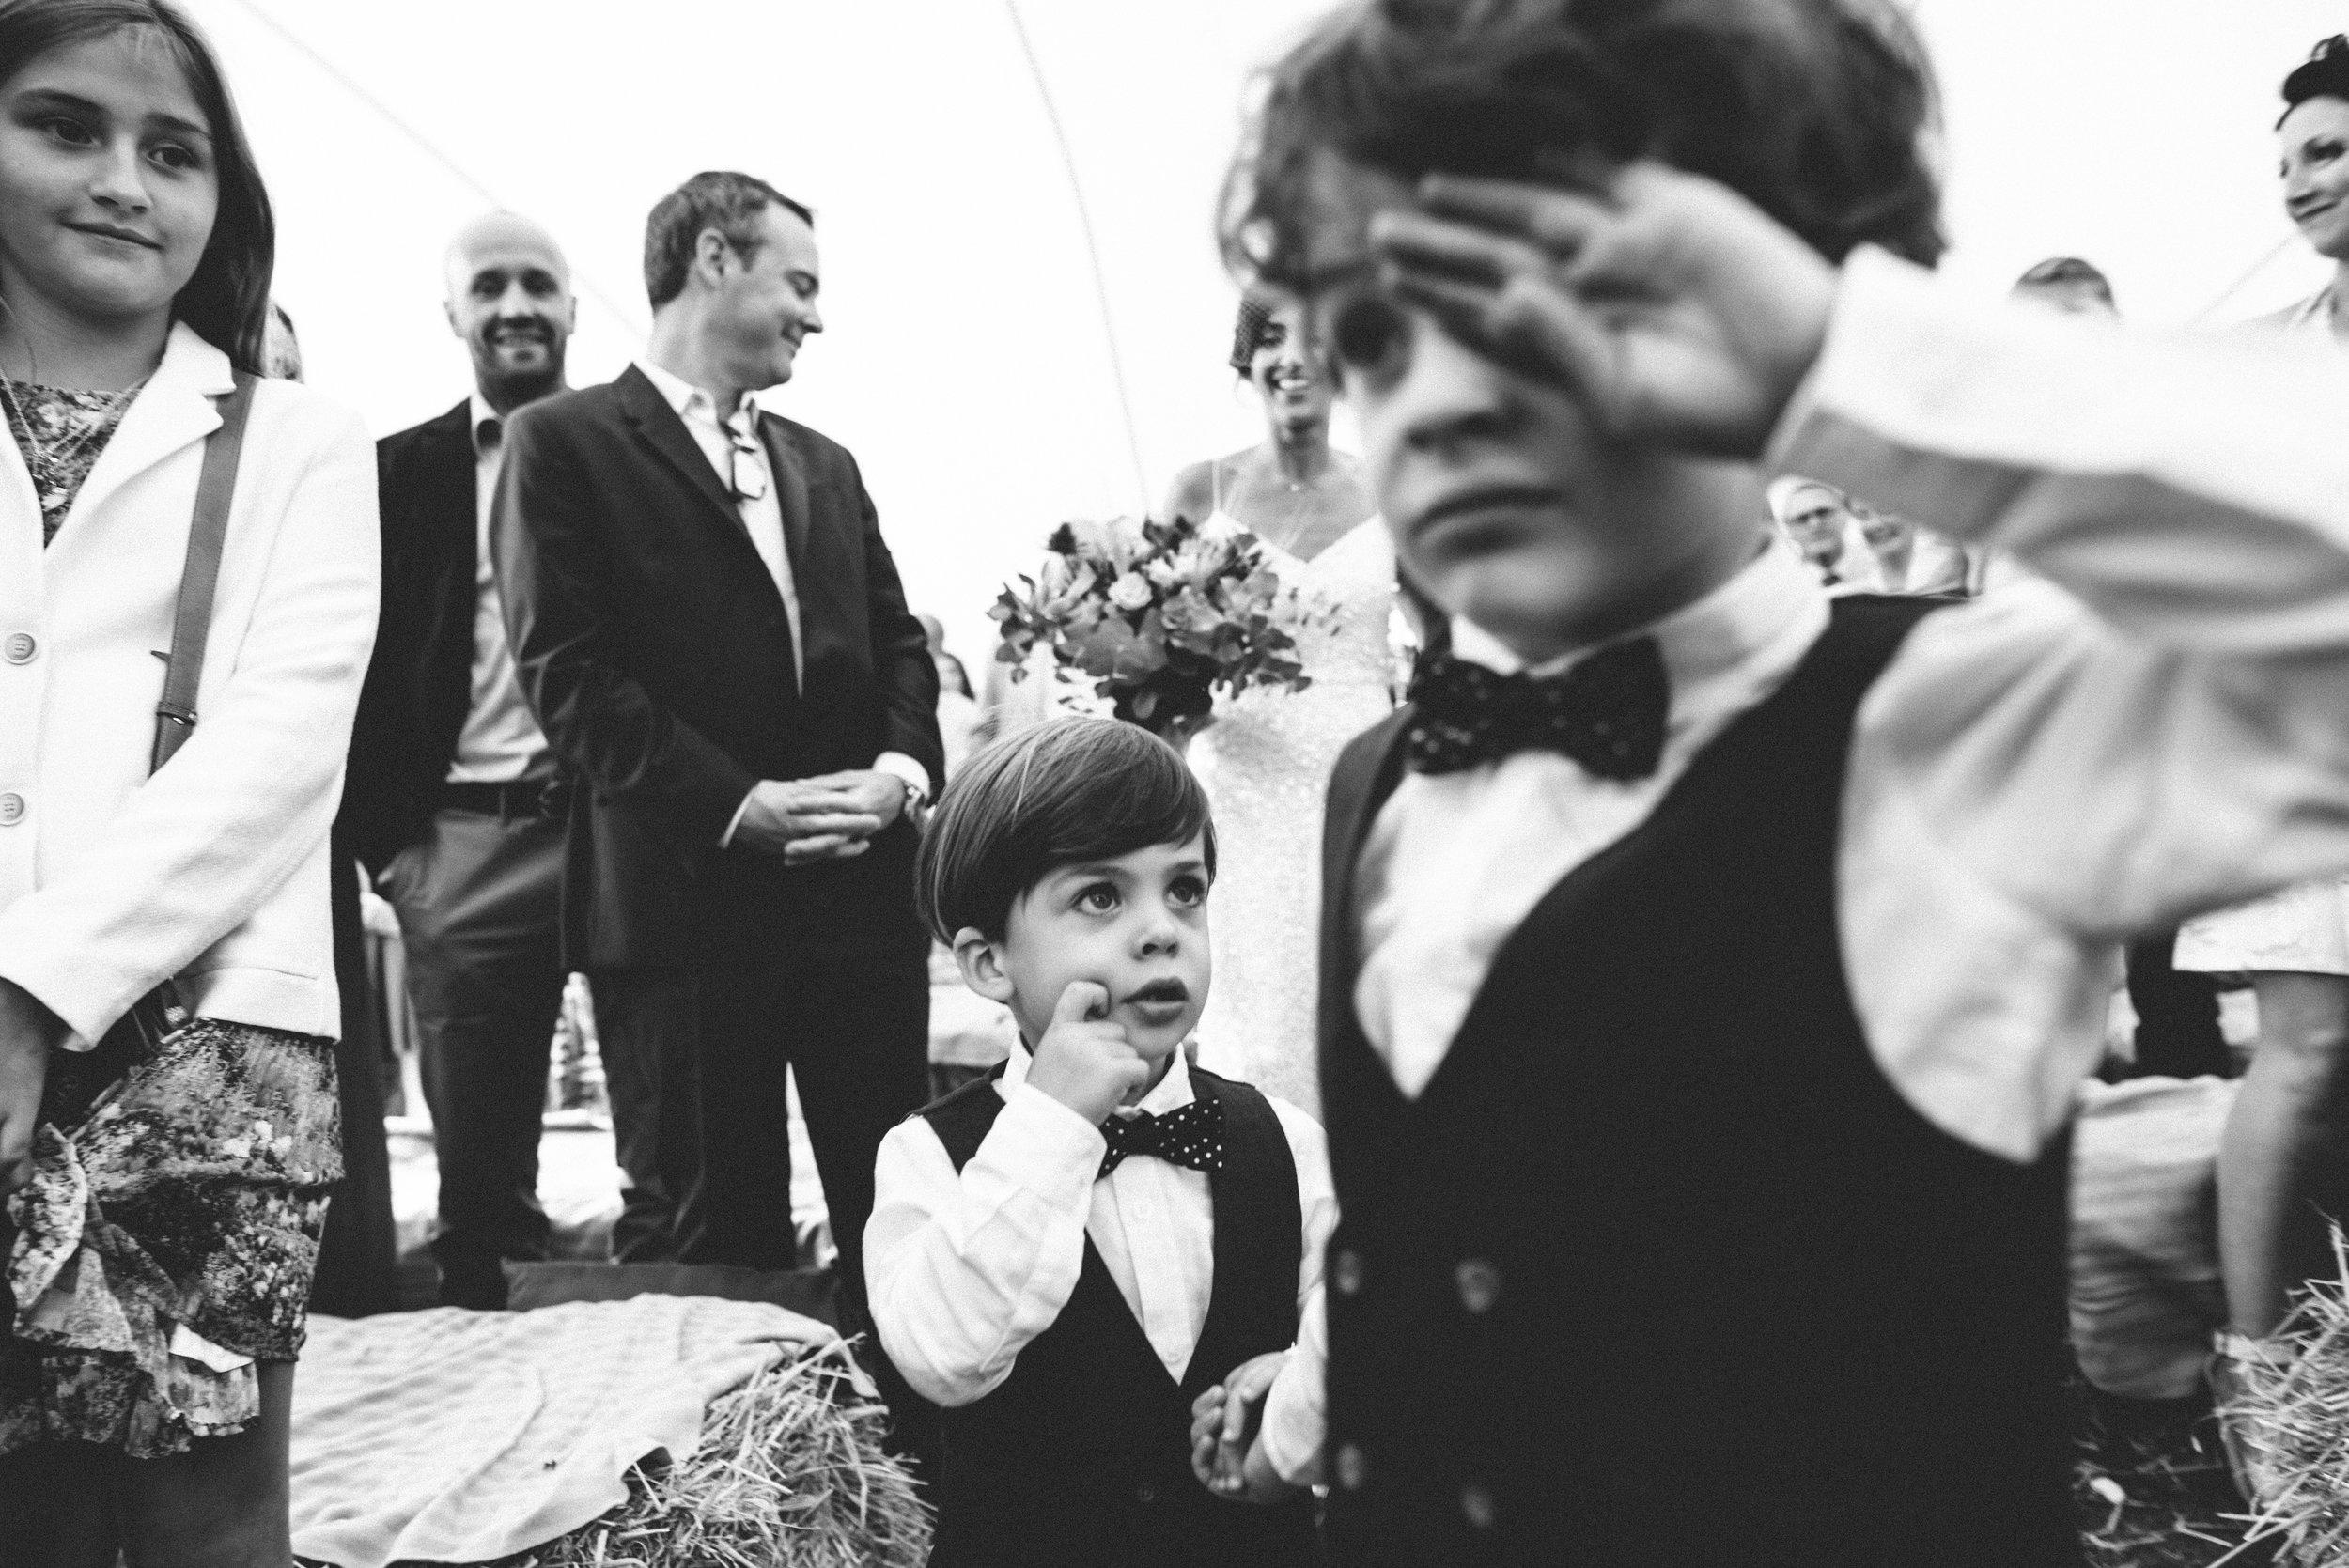 Garden Wedding photography Barley Herefordshire - Tracy + Matt -144.jpg